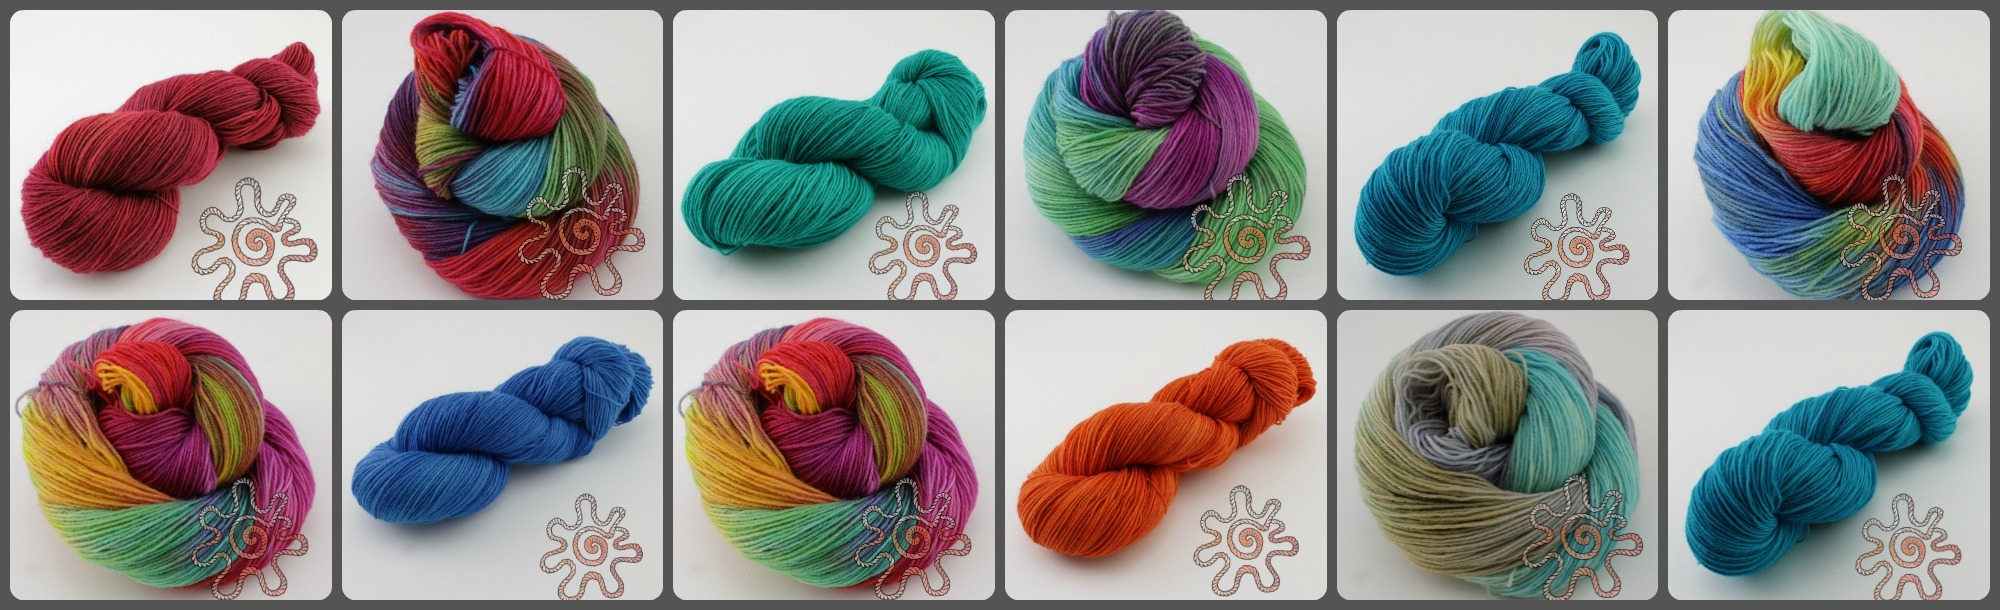 Sockenwolle_handgefaerbt